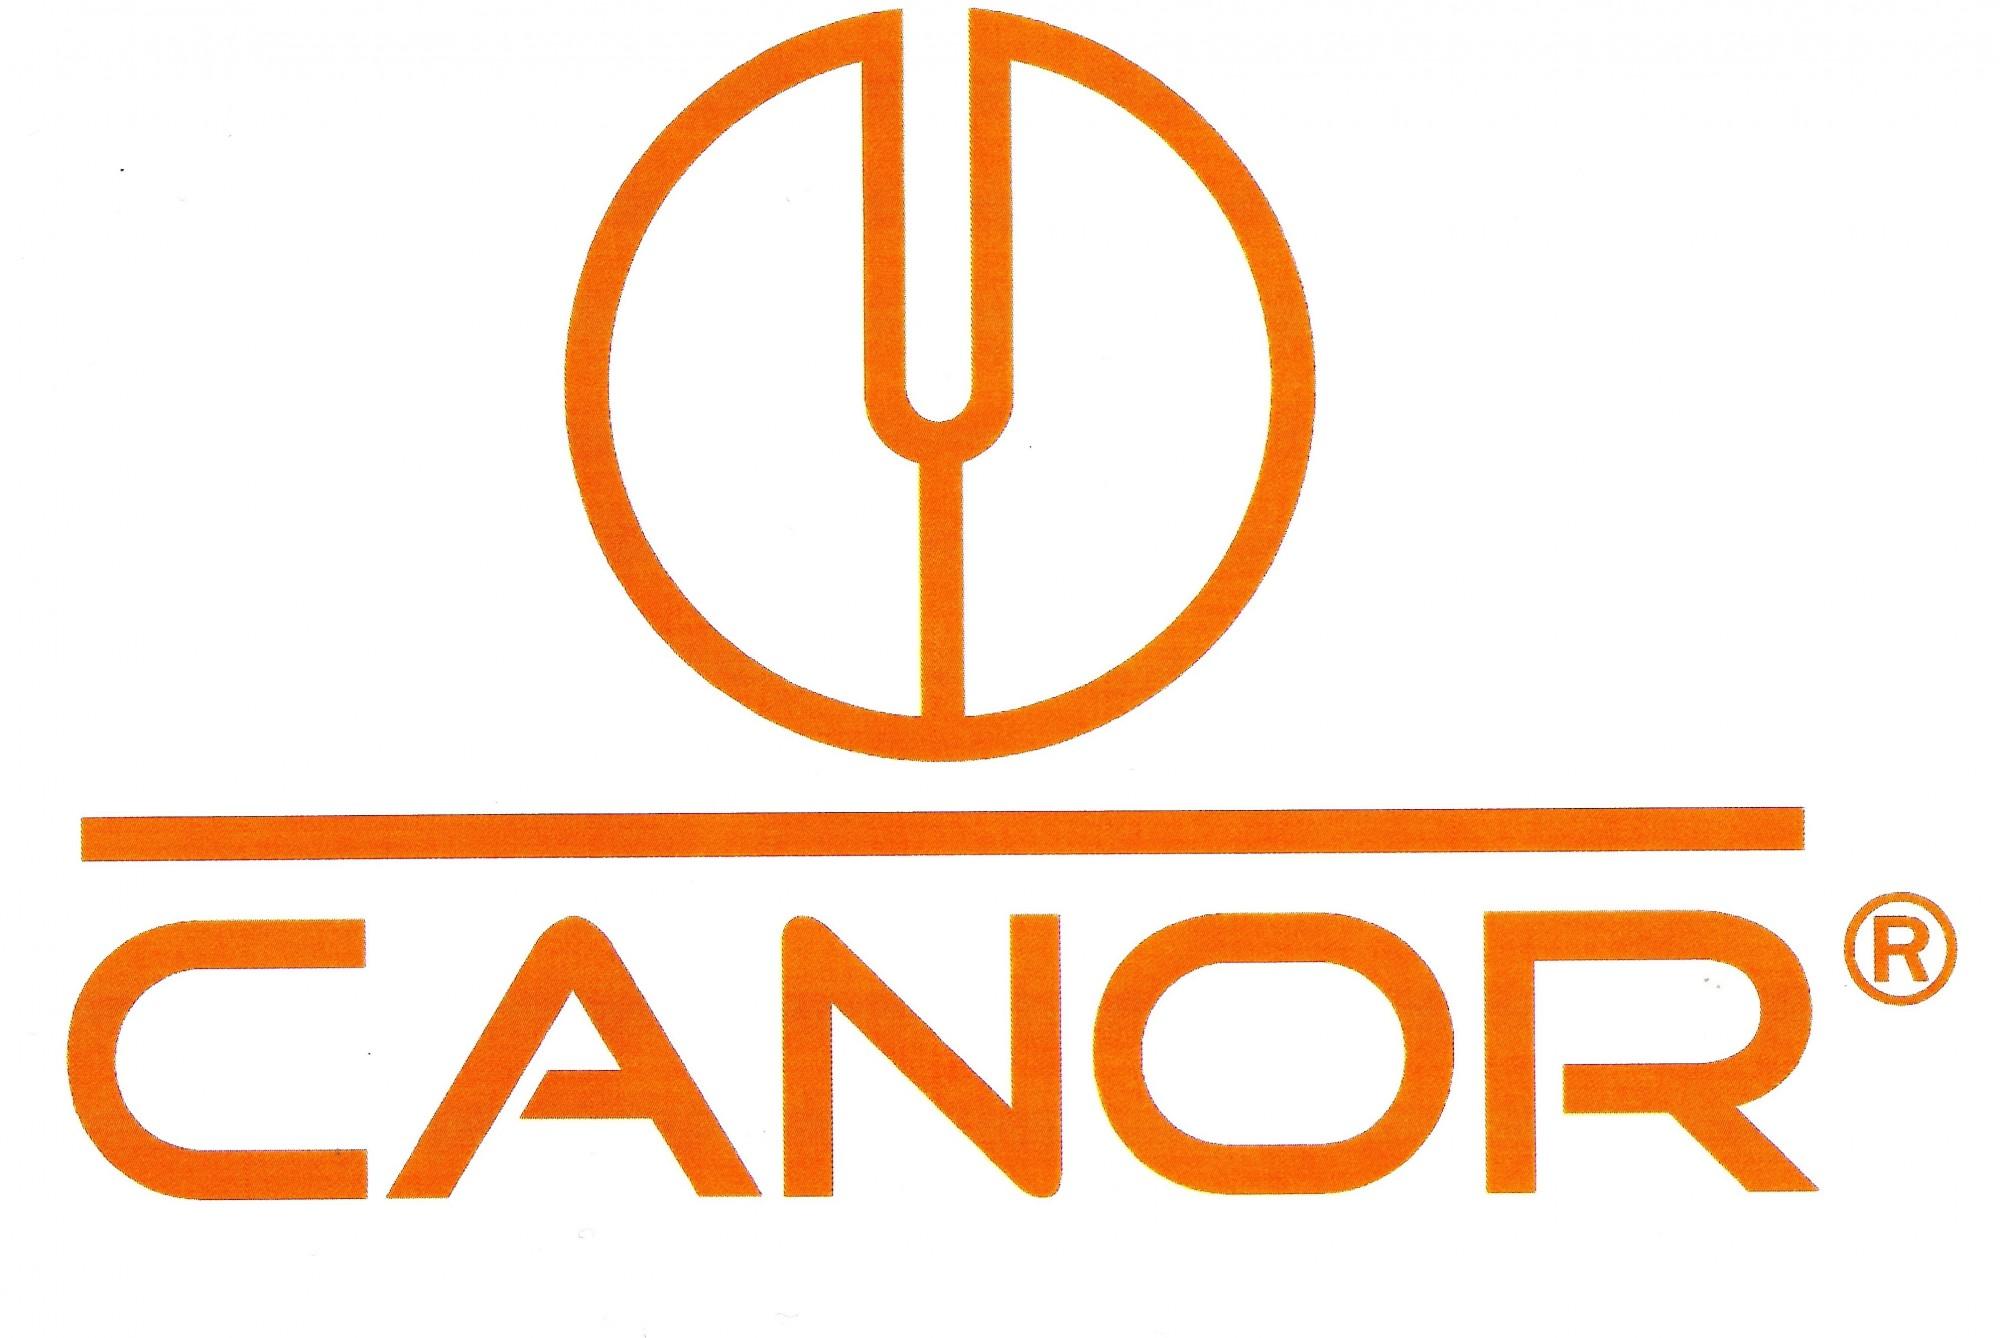 Canor